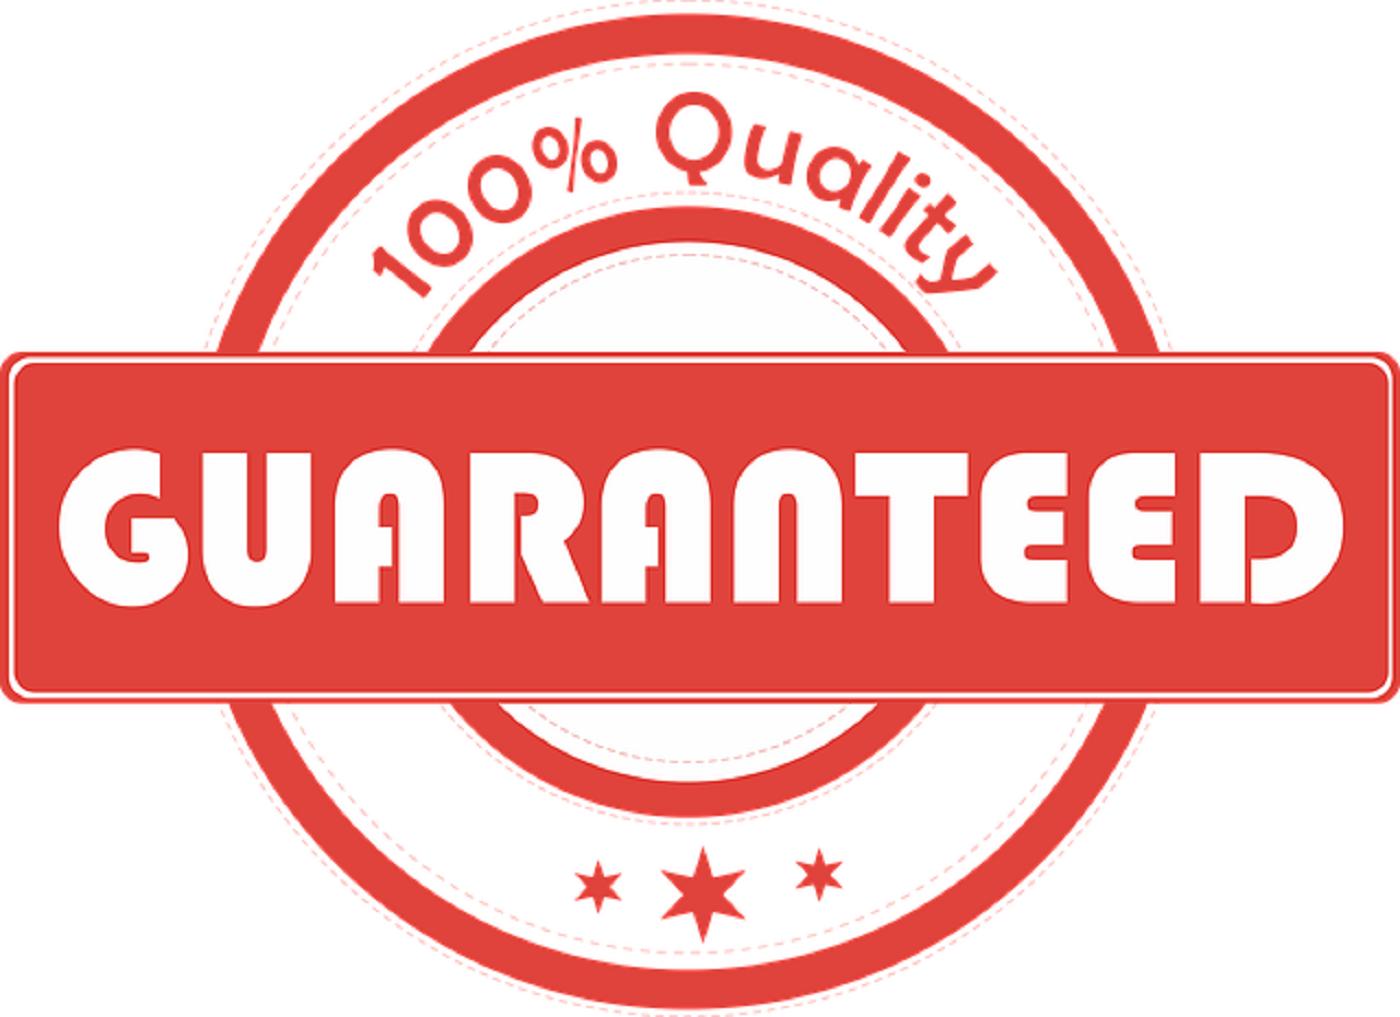 ebay guarantee works info